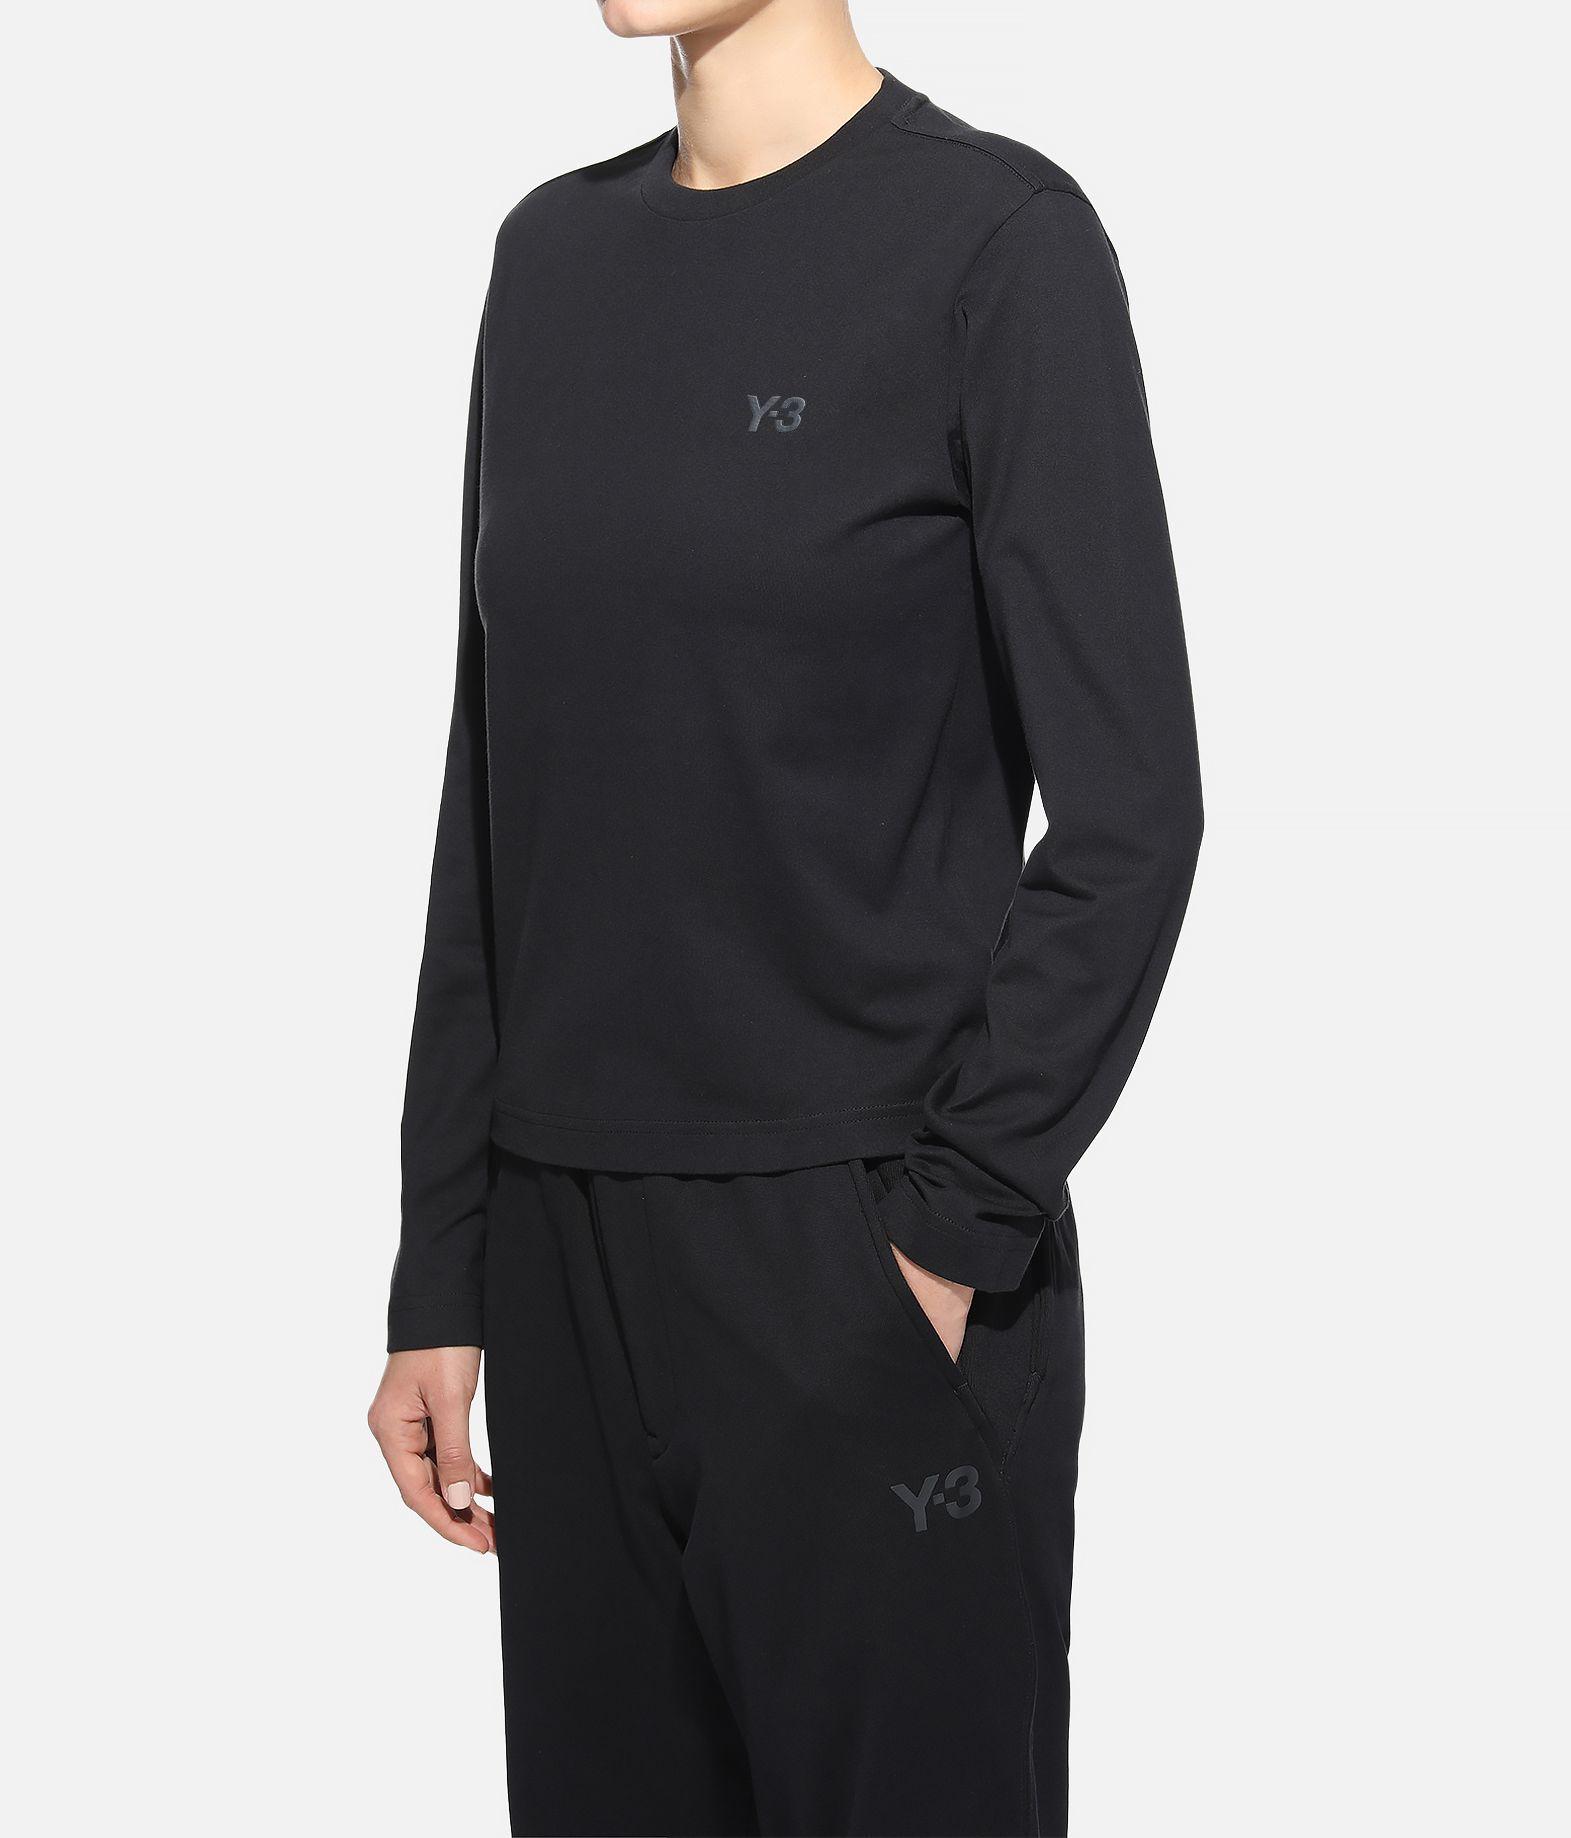 Y-3 Y-3 Long Sleeve Tee  Long sleeve t-shirt Woman e